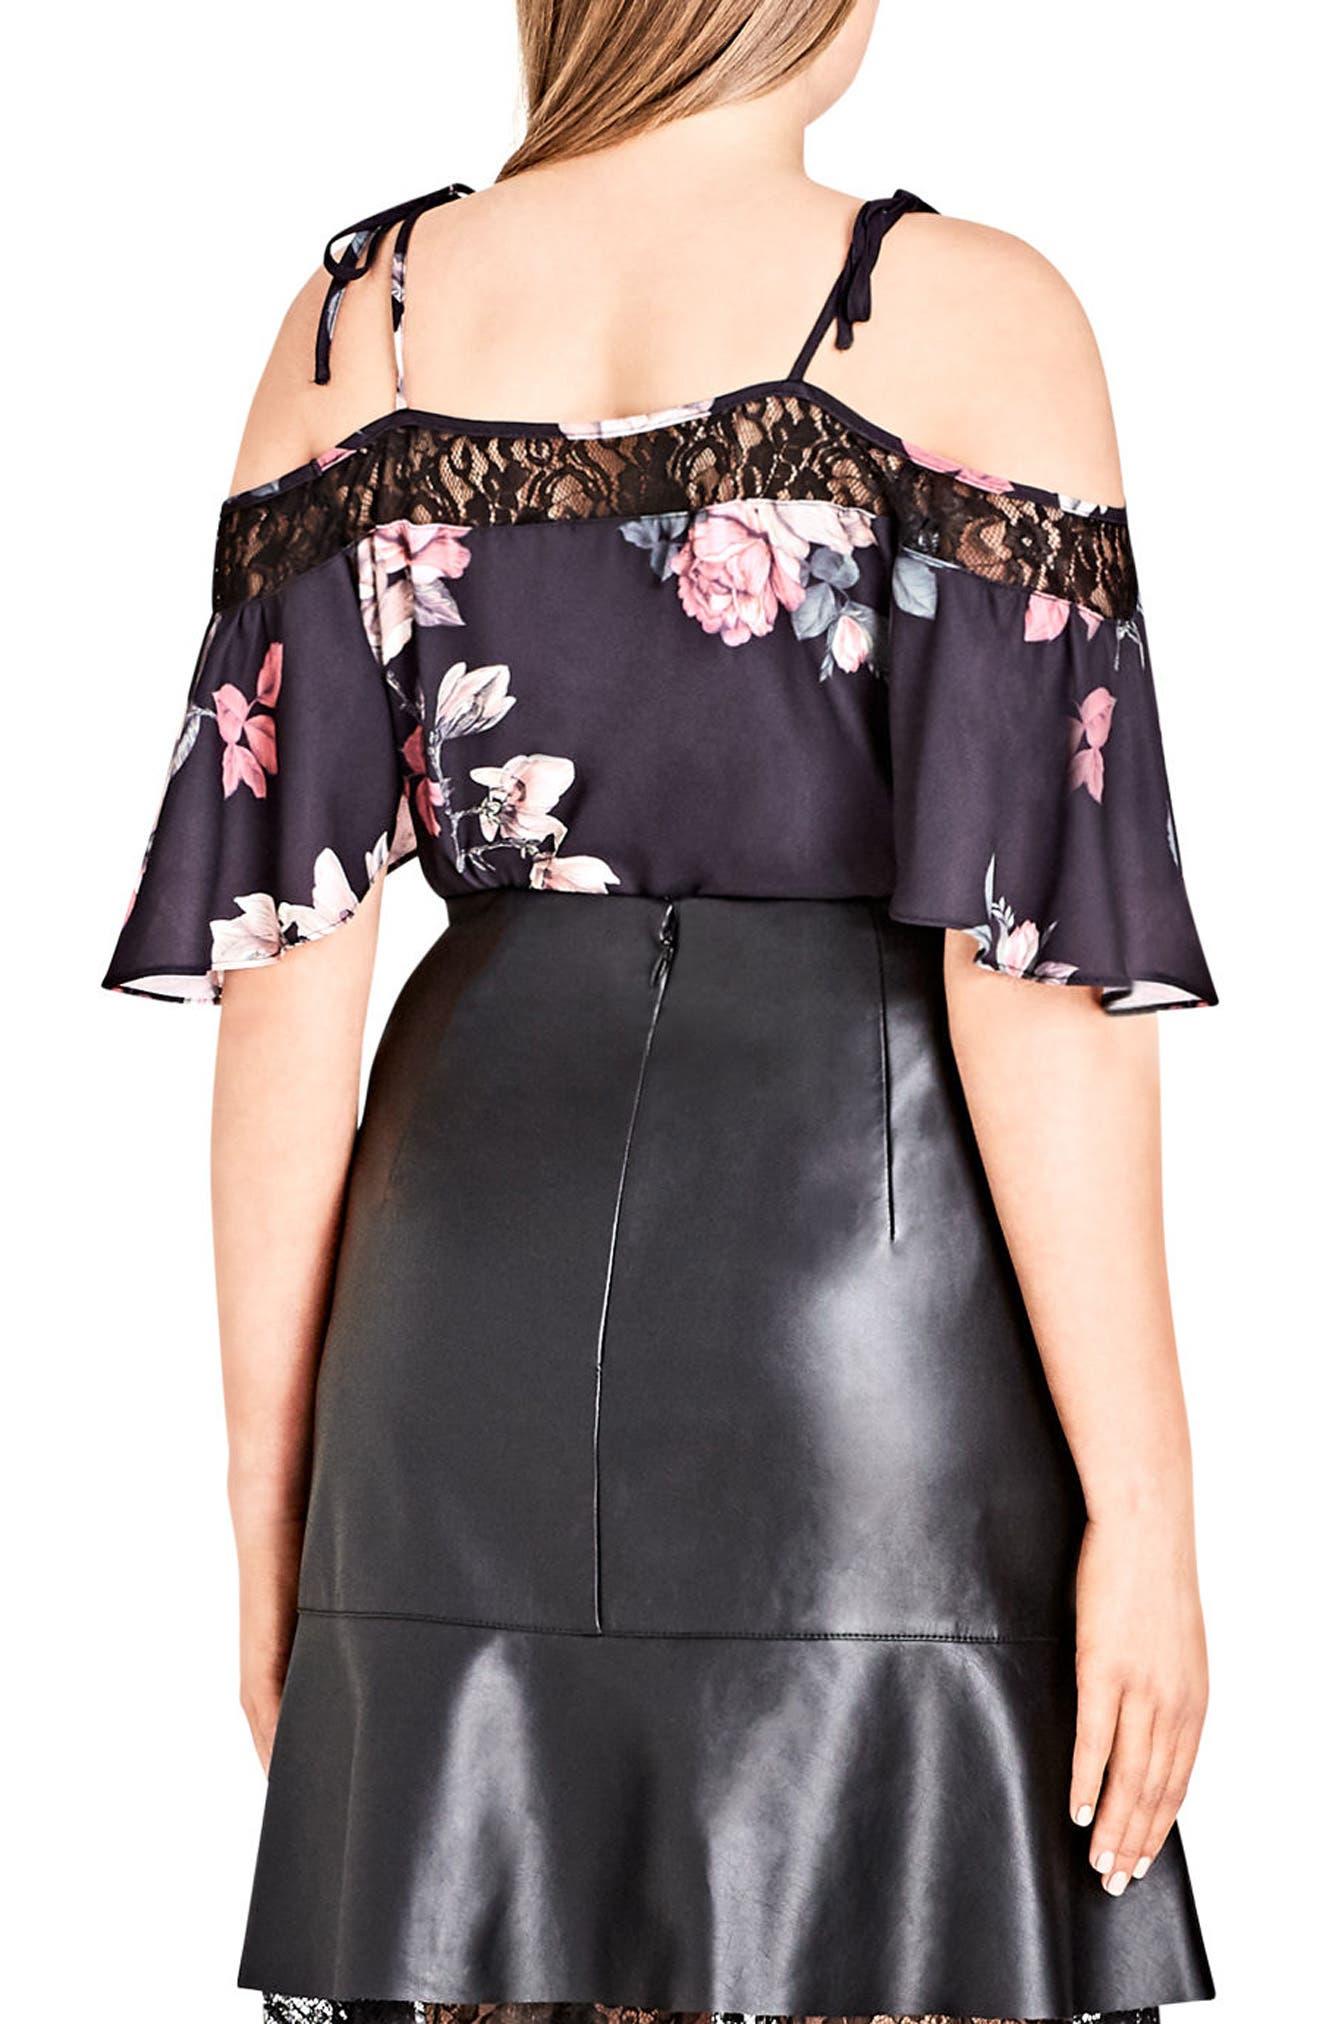 Lace Trim Floral Off the Shoulder Top,                             Alternate thumbnail 2, color,                             Mirror Rose